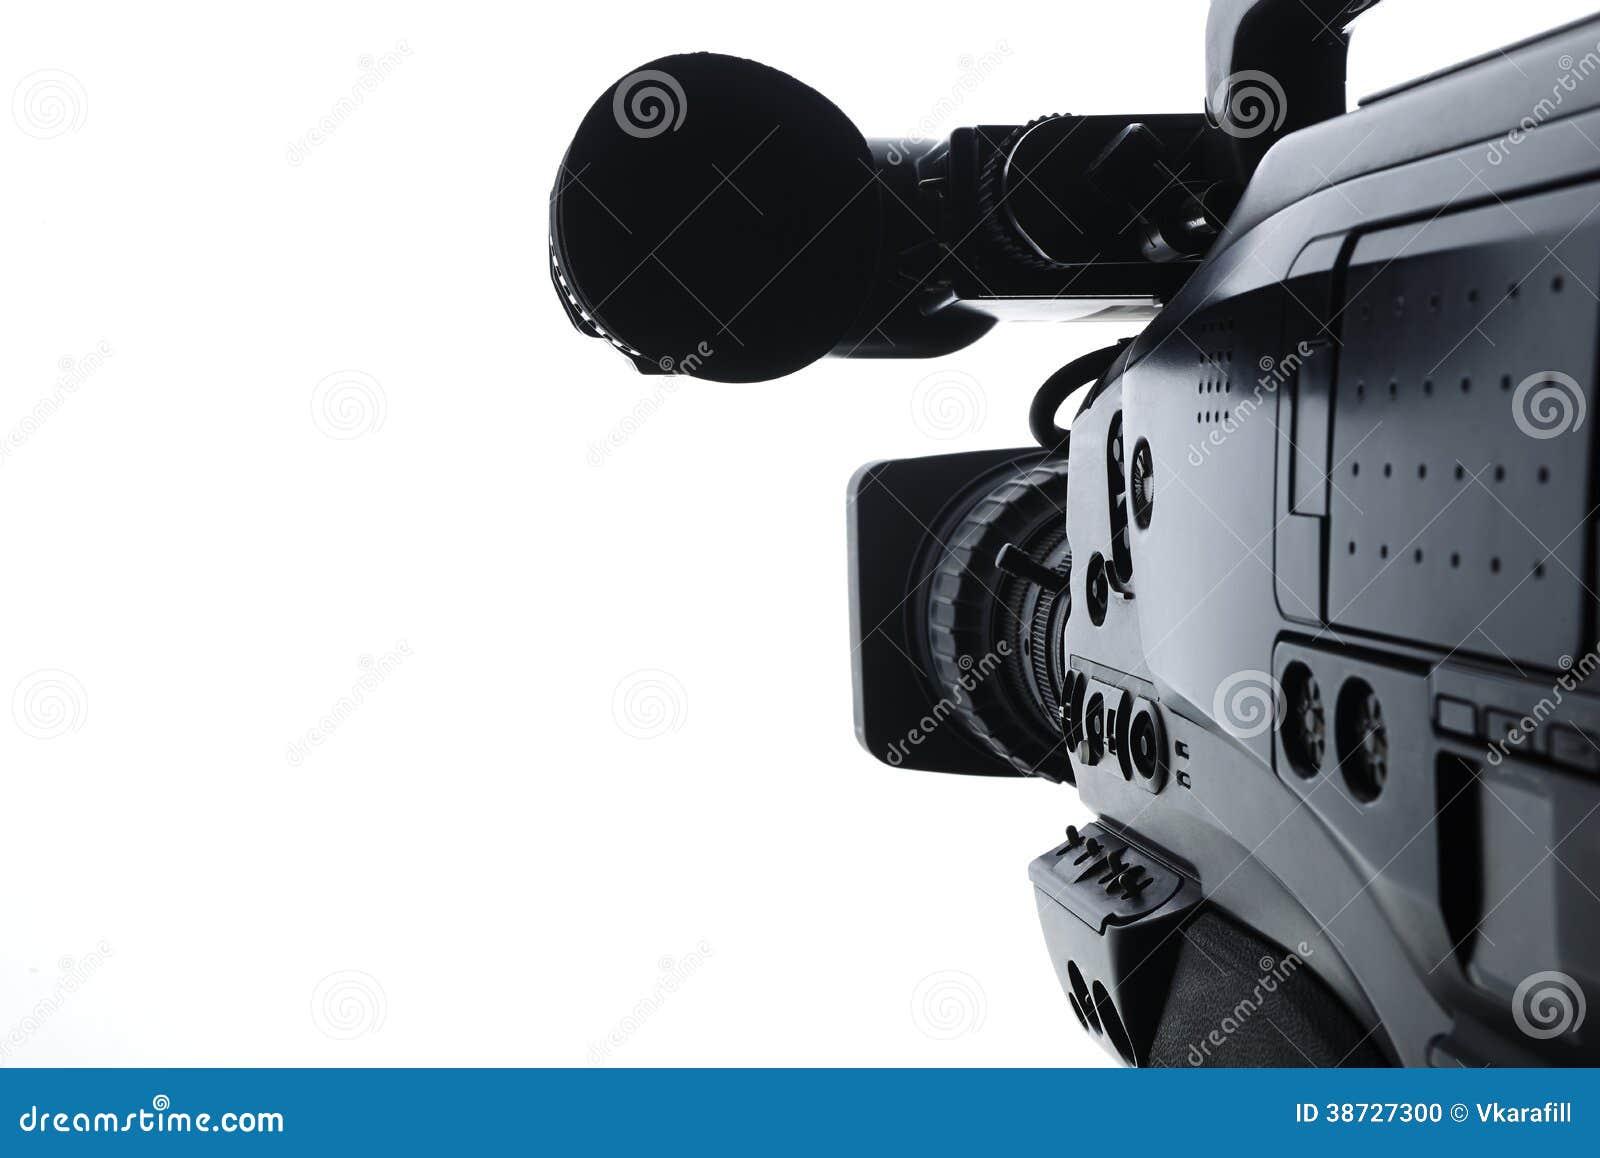 Professional Digital Video Camera Stock Photo - Image ...